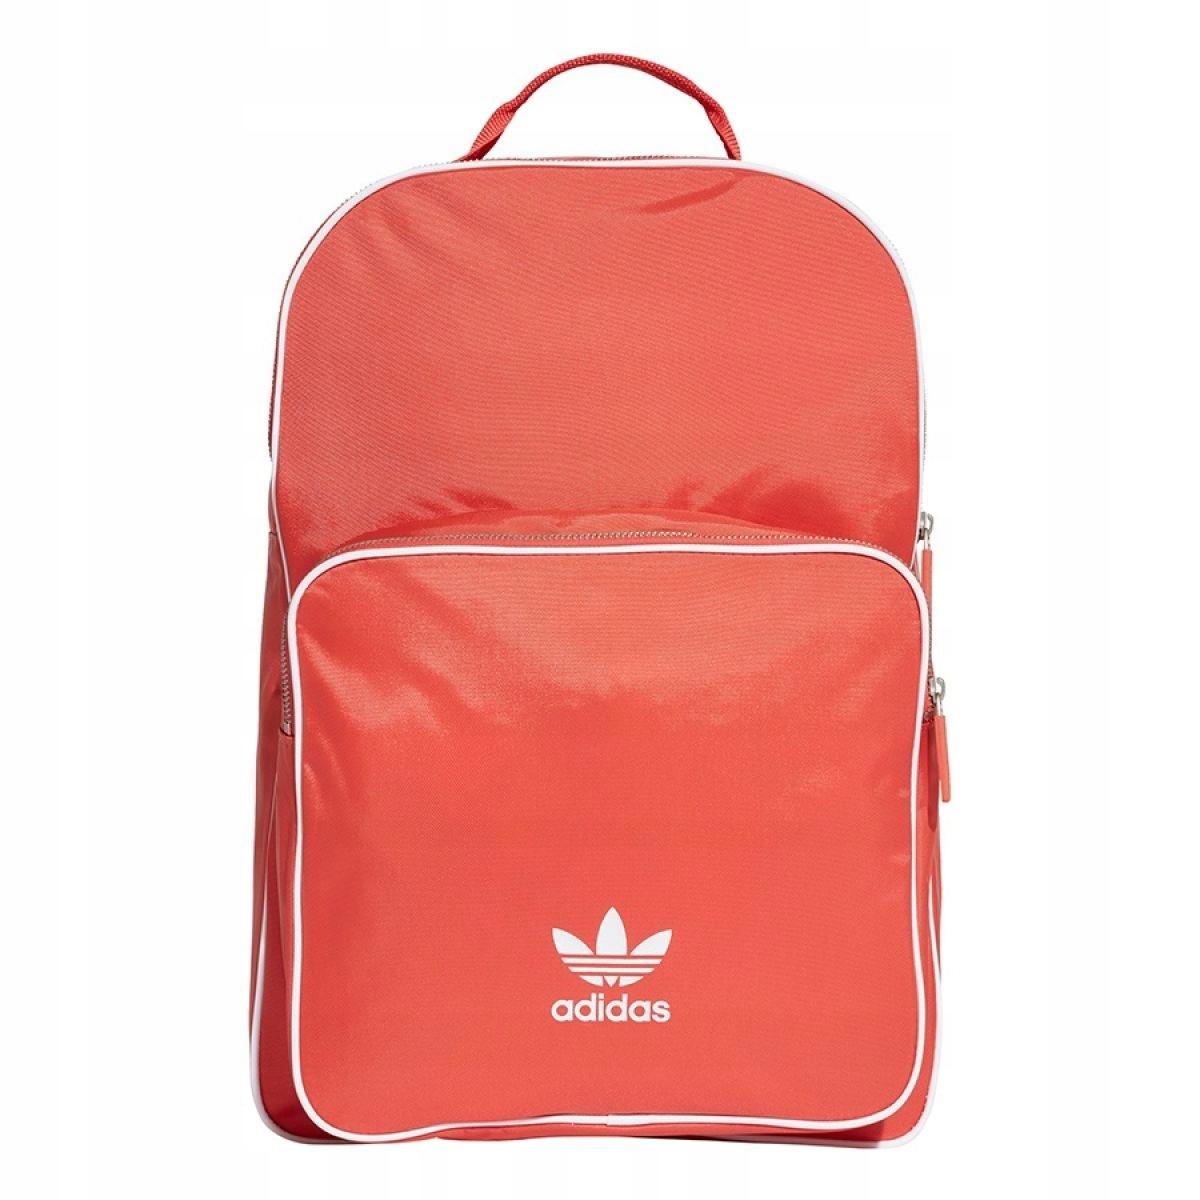 8b6b3ed070f83 Plecak adidas Originals Classic CW0630 - 7517864676 - oficjalne ...